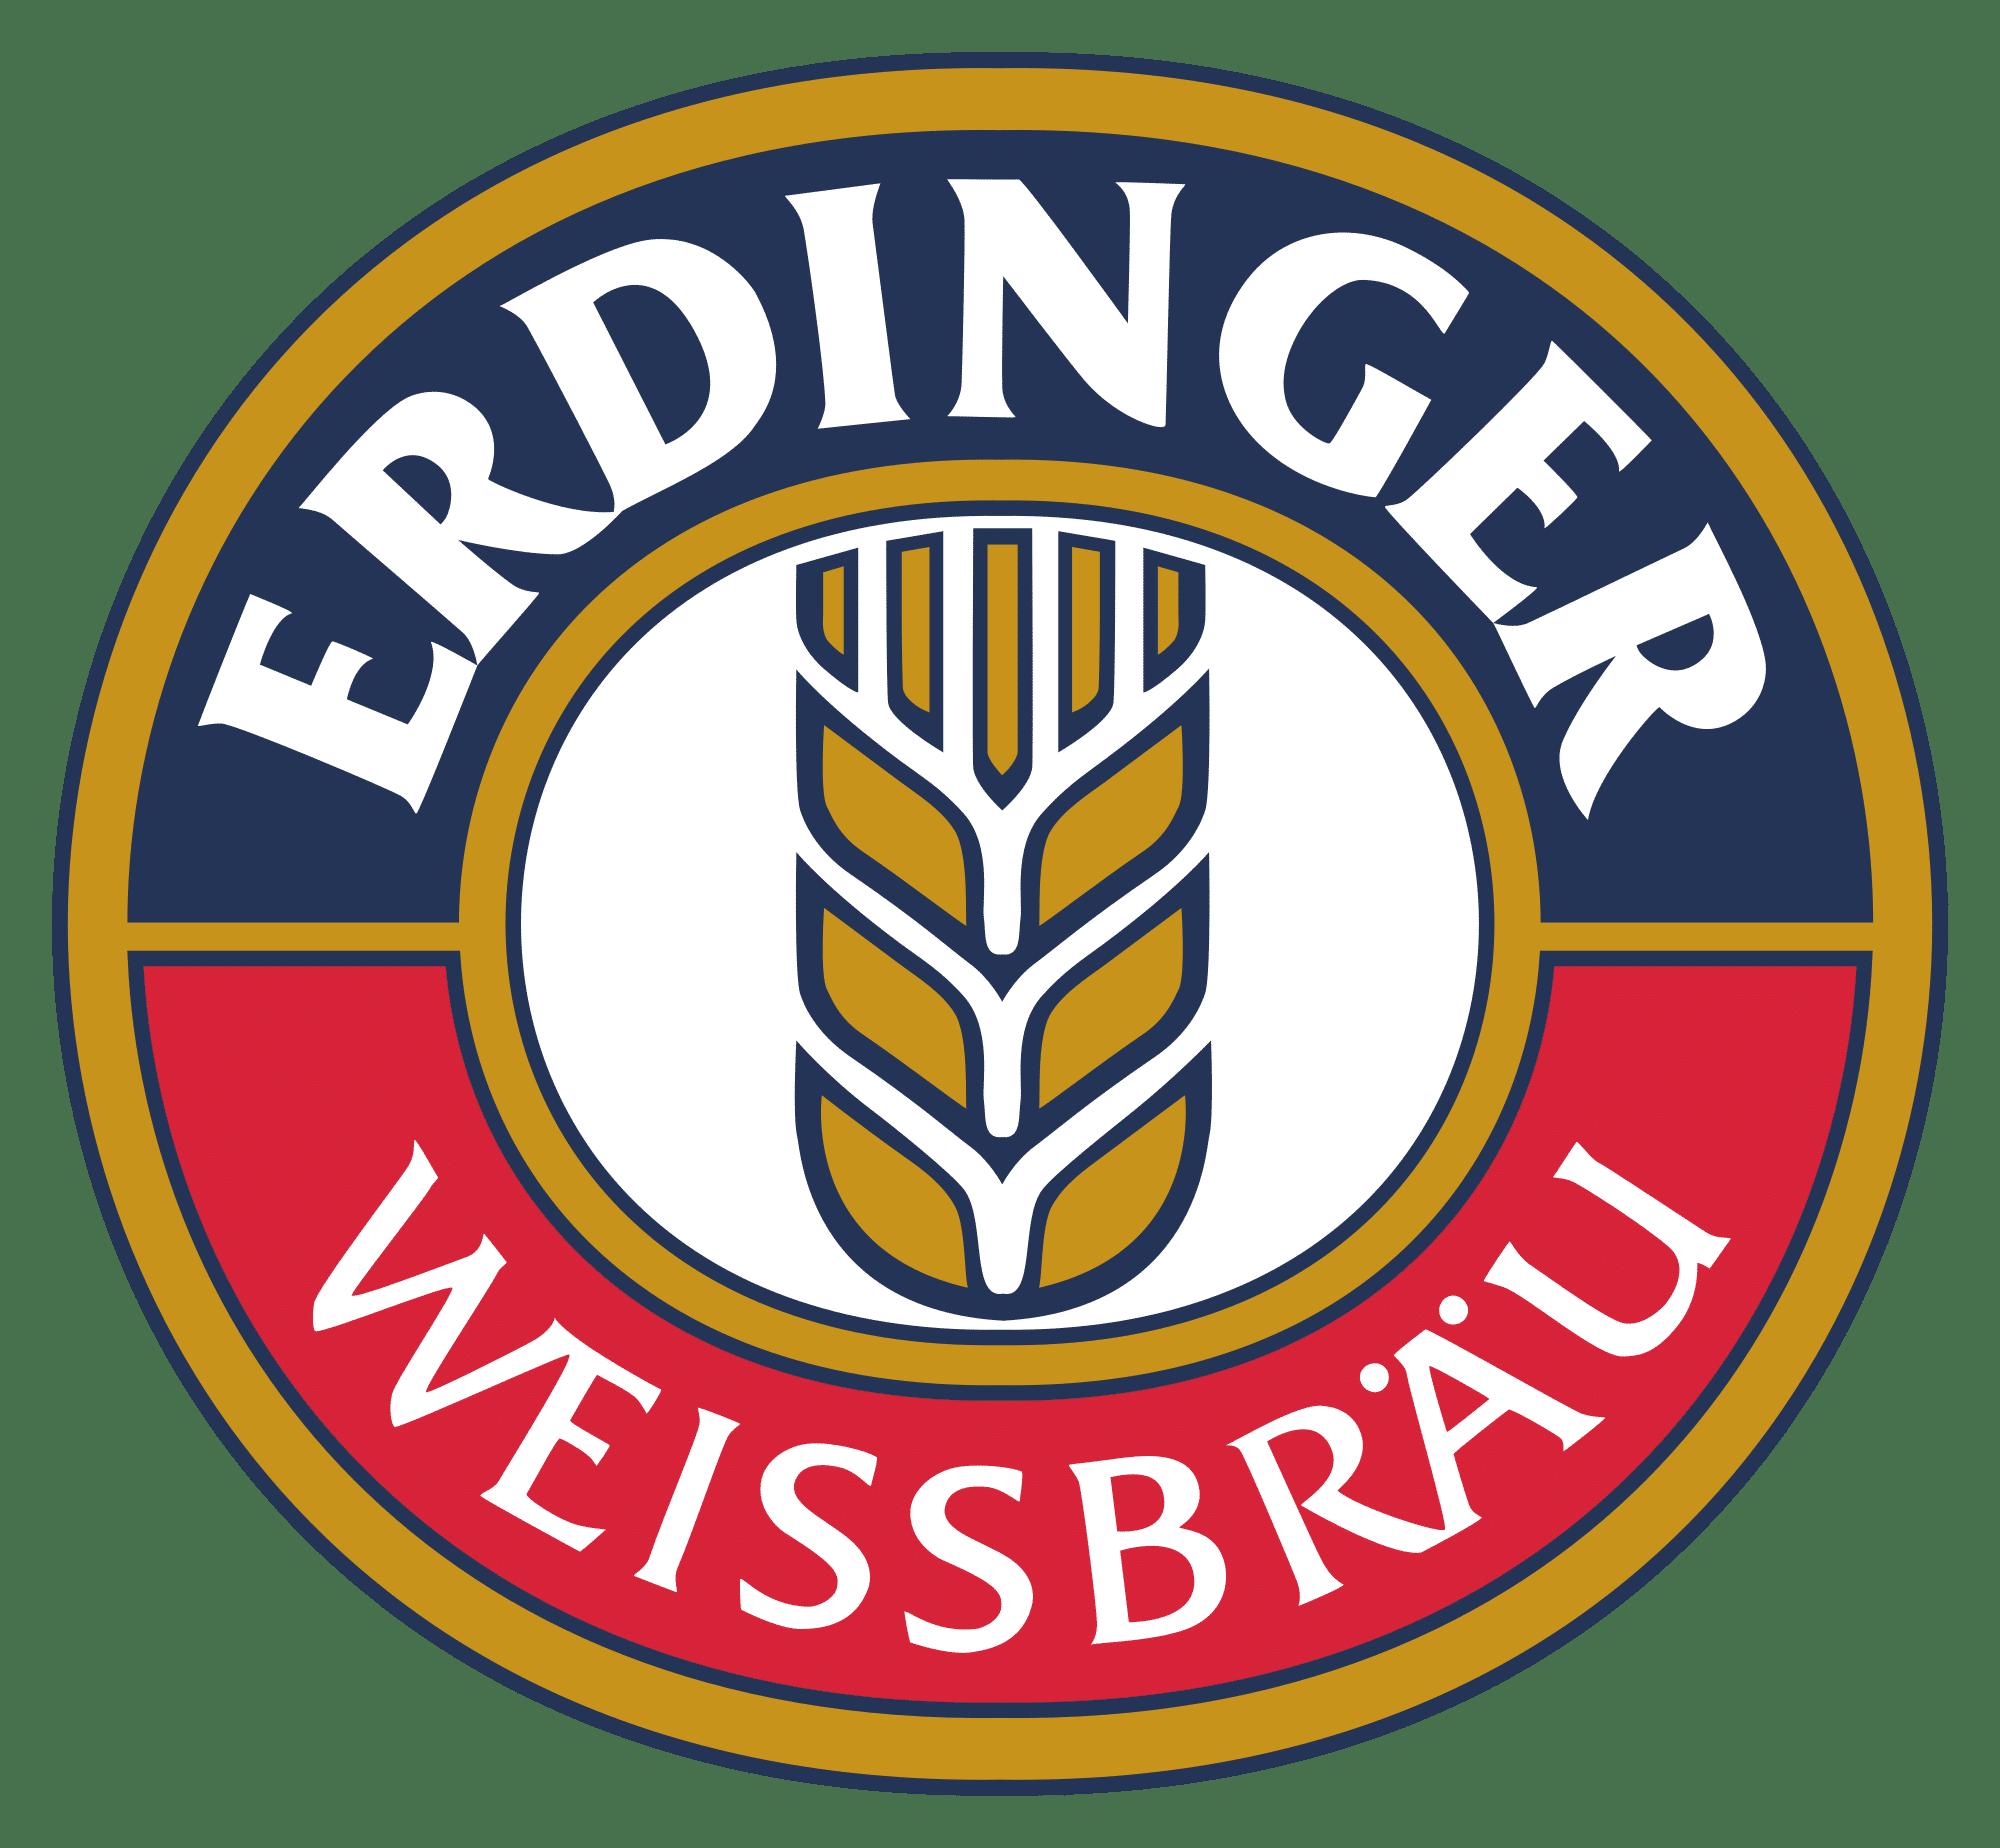 Privatbrauerei ERDINGER Weißbräu Werner Brombach GmbH Lange Zeile 1 + 3 85435 Erding https://de.erdinger.de/